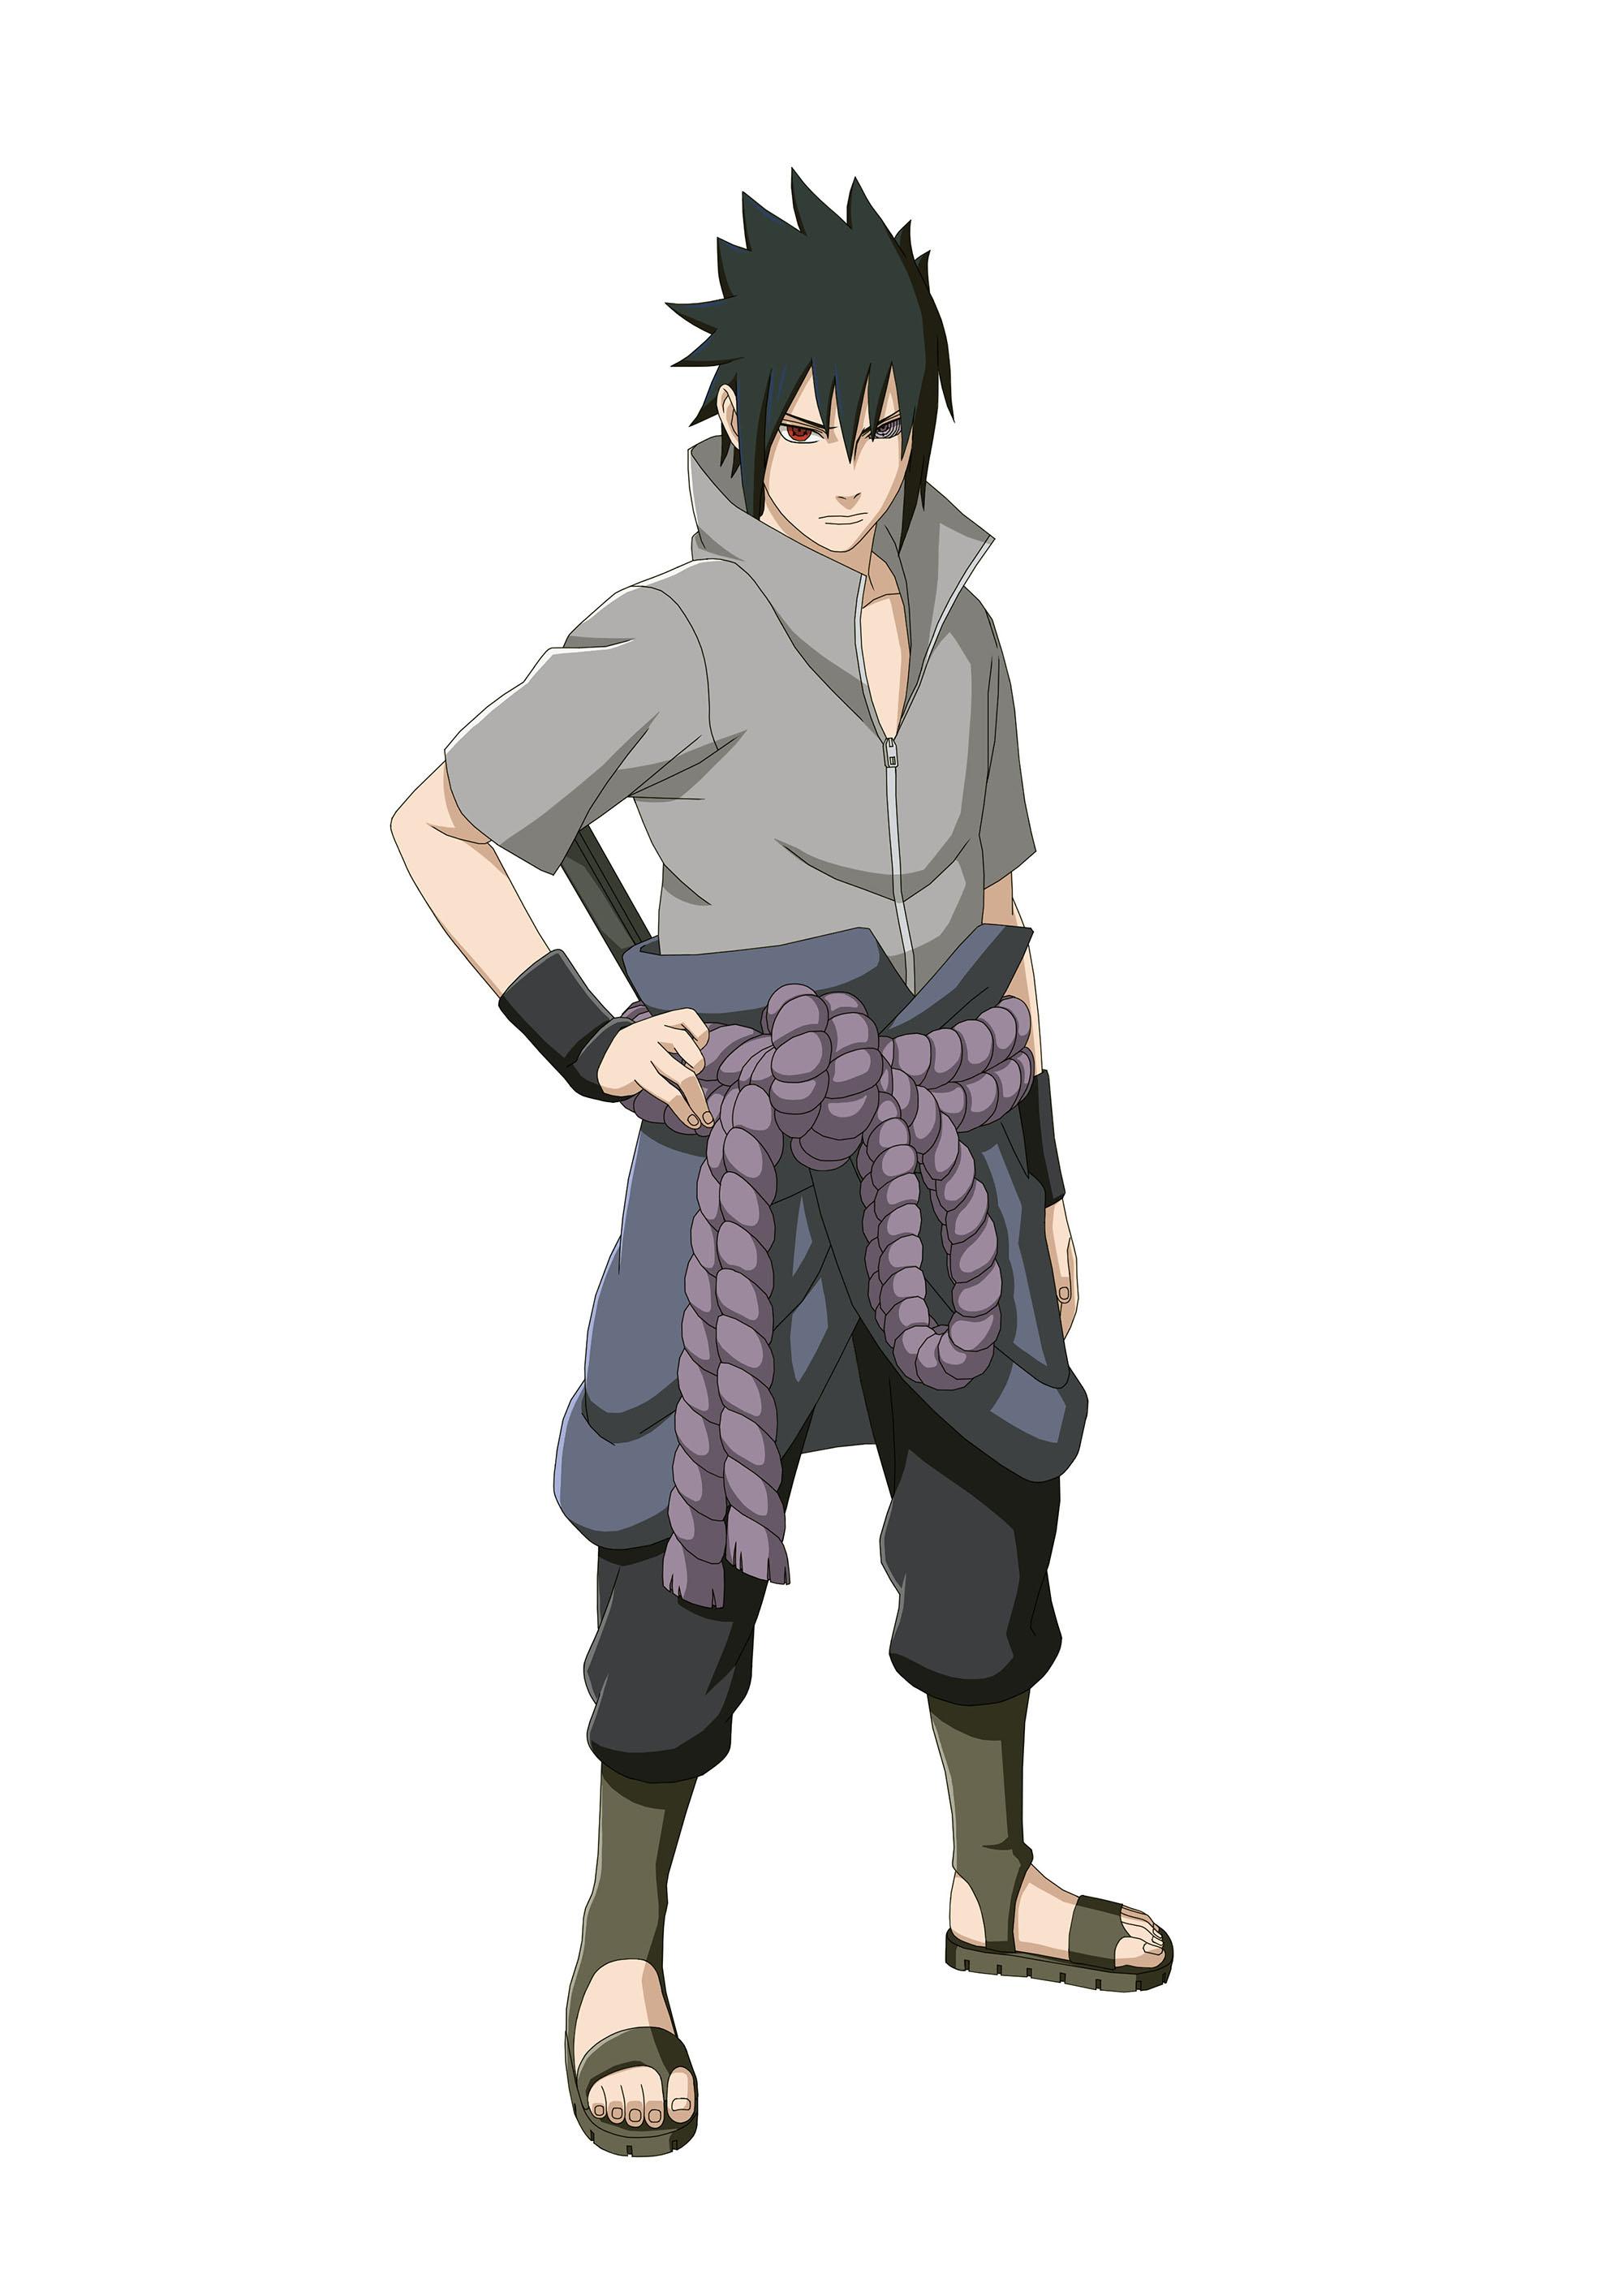 Naruto Shippuden: Ultimate Ninja Storm 4 Sasuke Rinnegan artwork